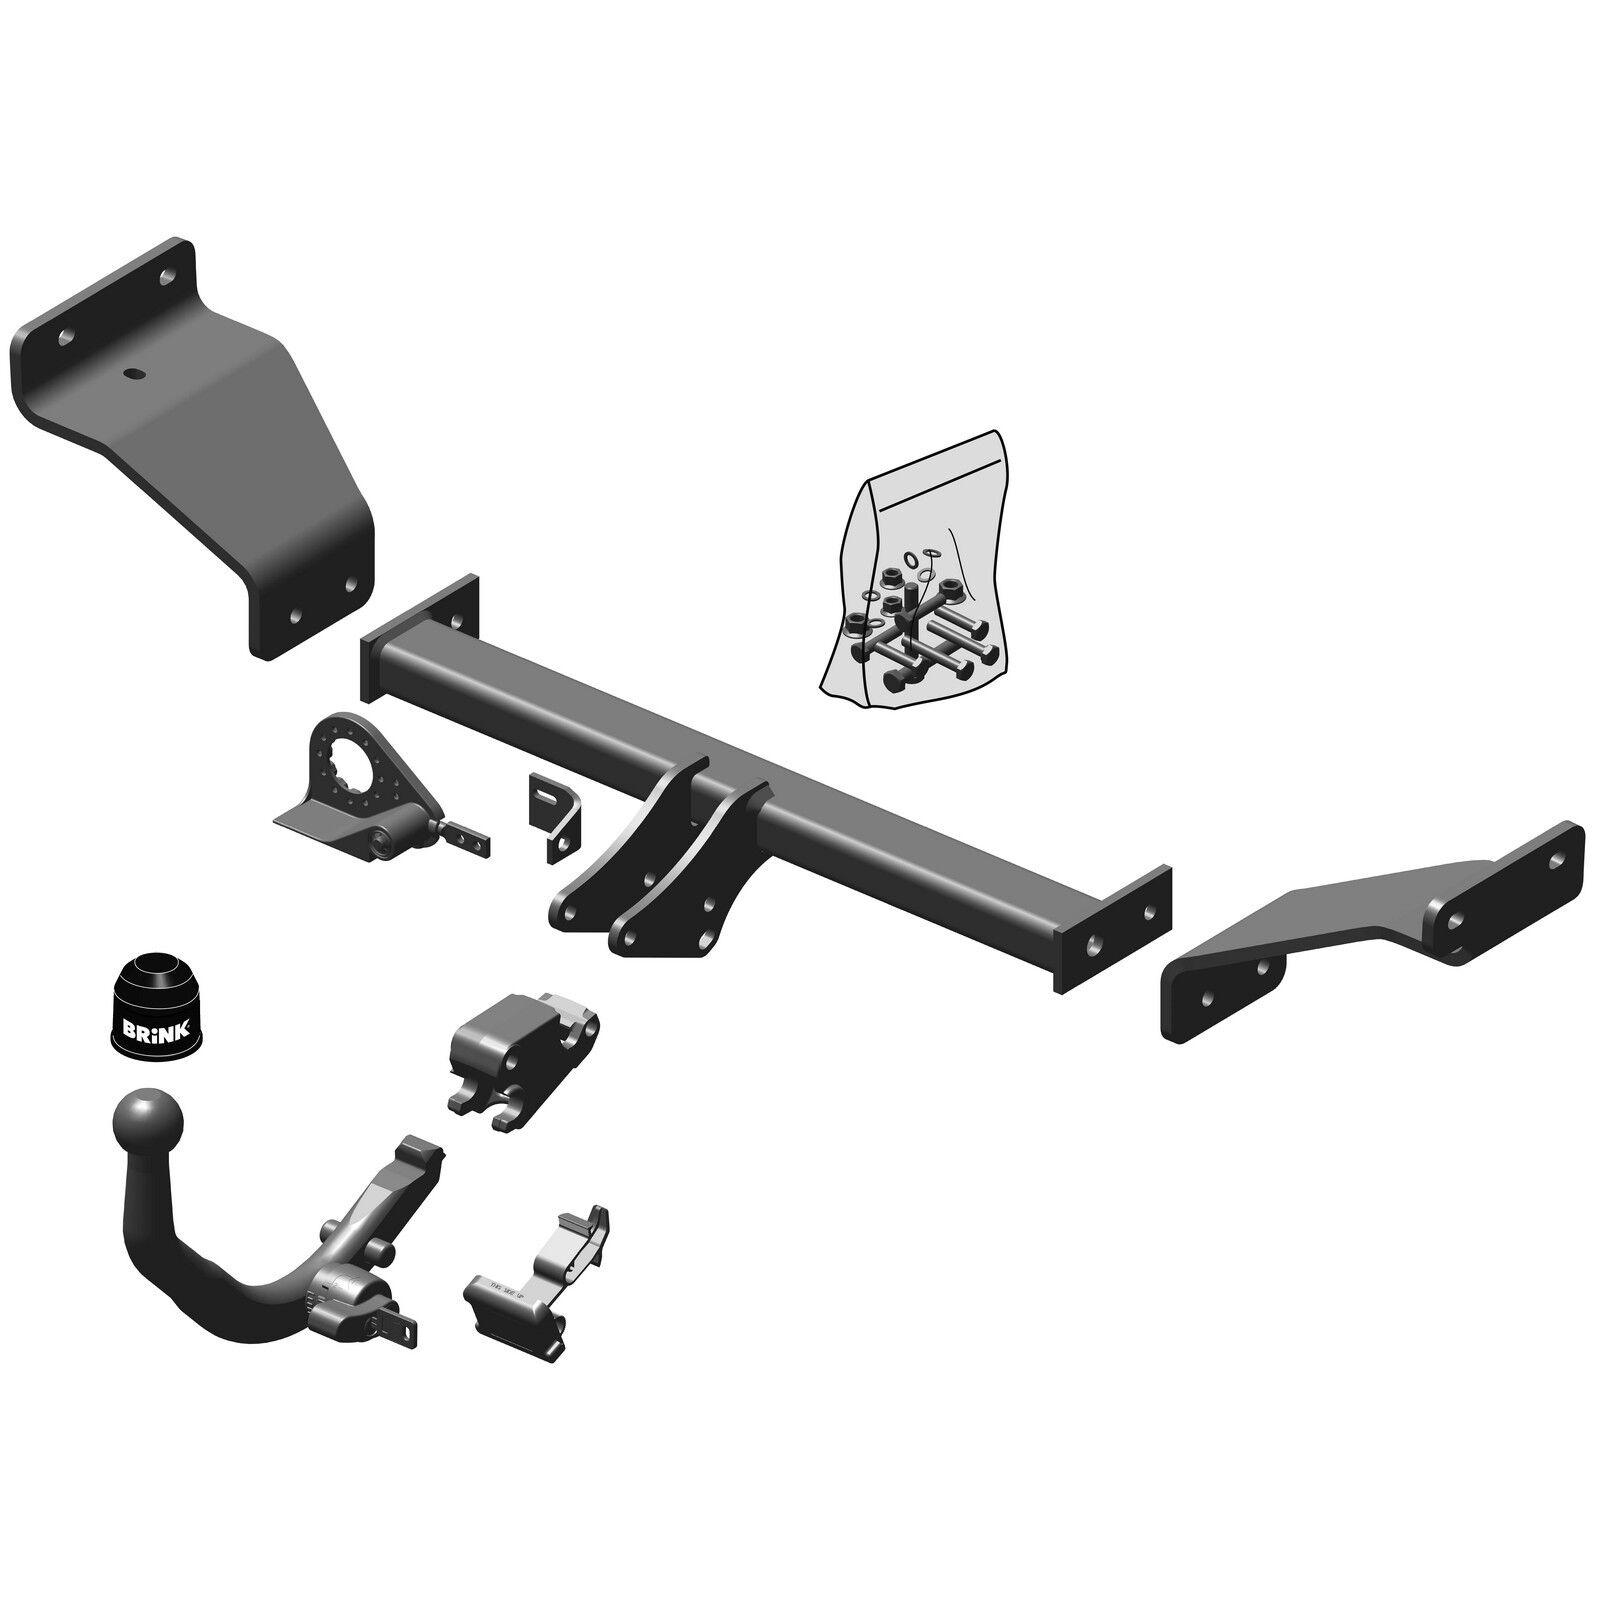 Brink Towbar for Hyundai i30 Estate 2012-2017 Detachable Tow Bar